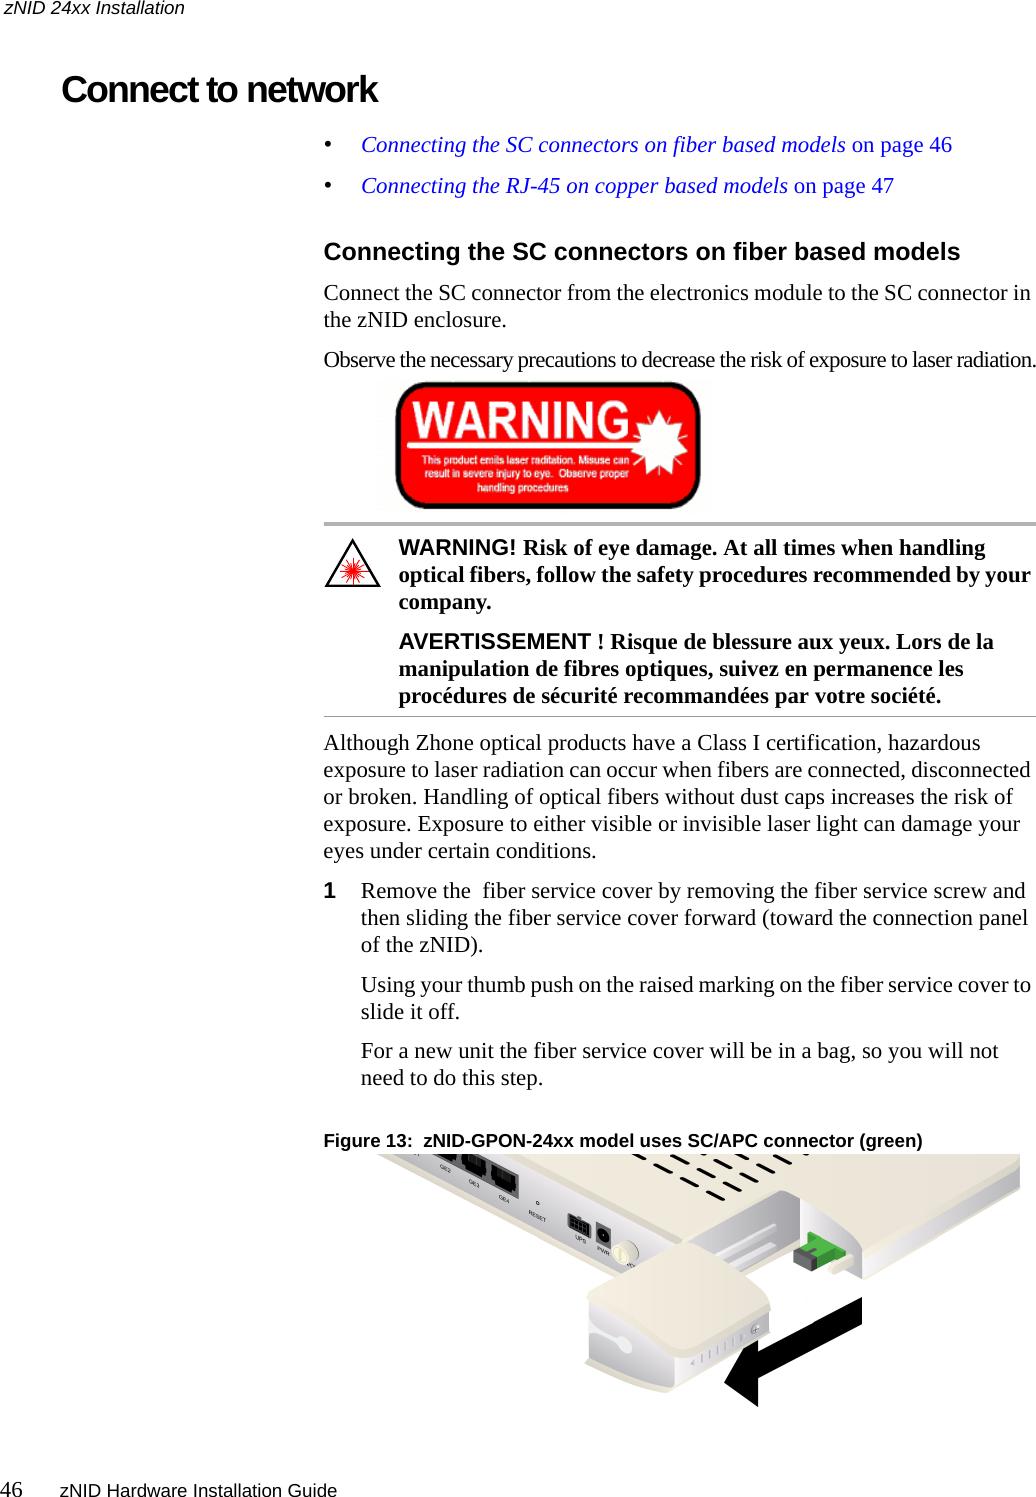 solution 488 user manual